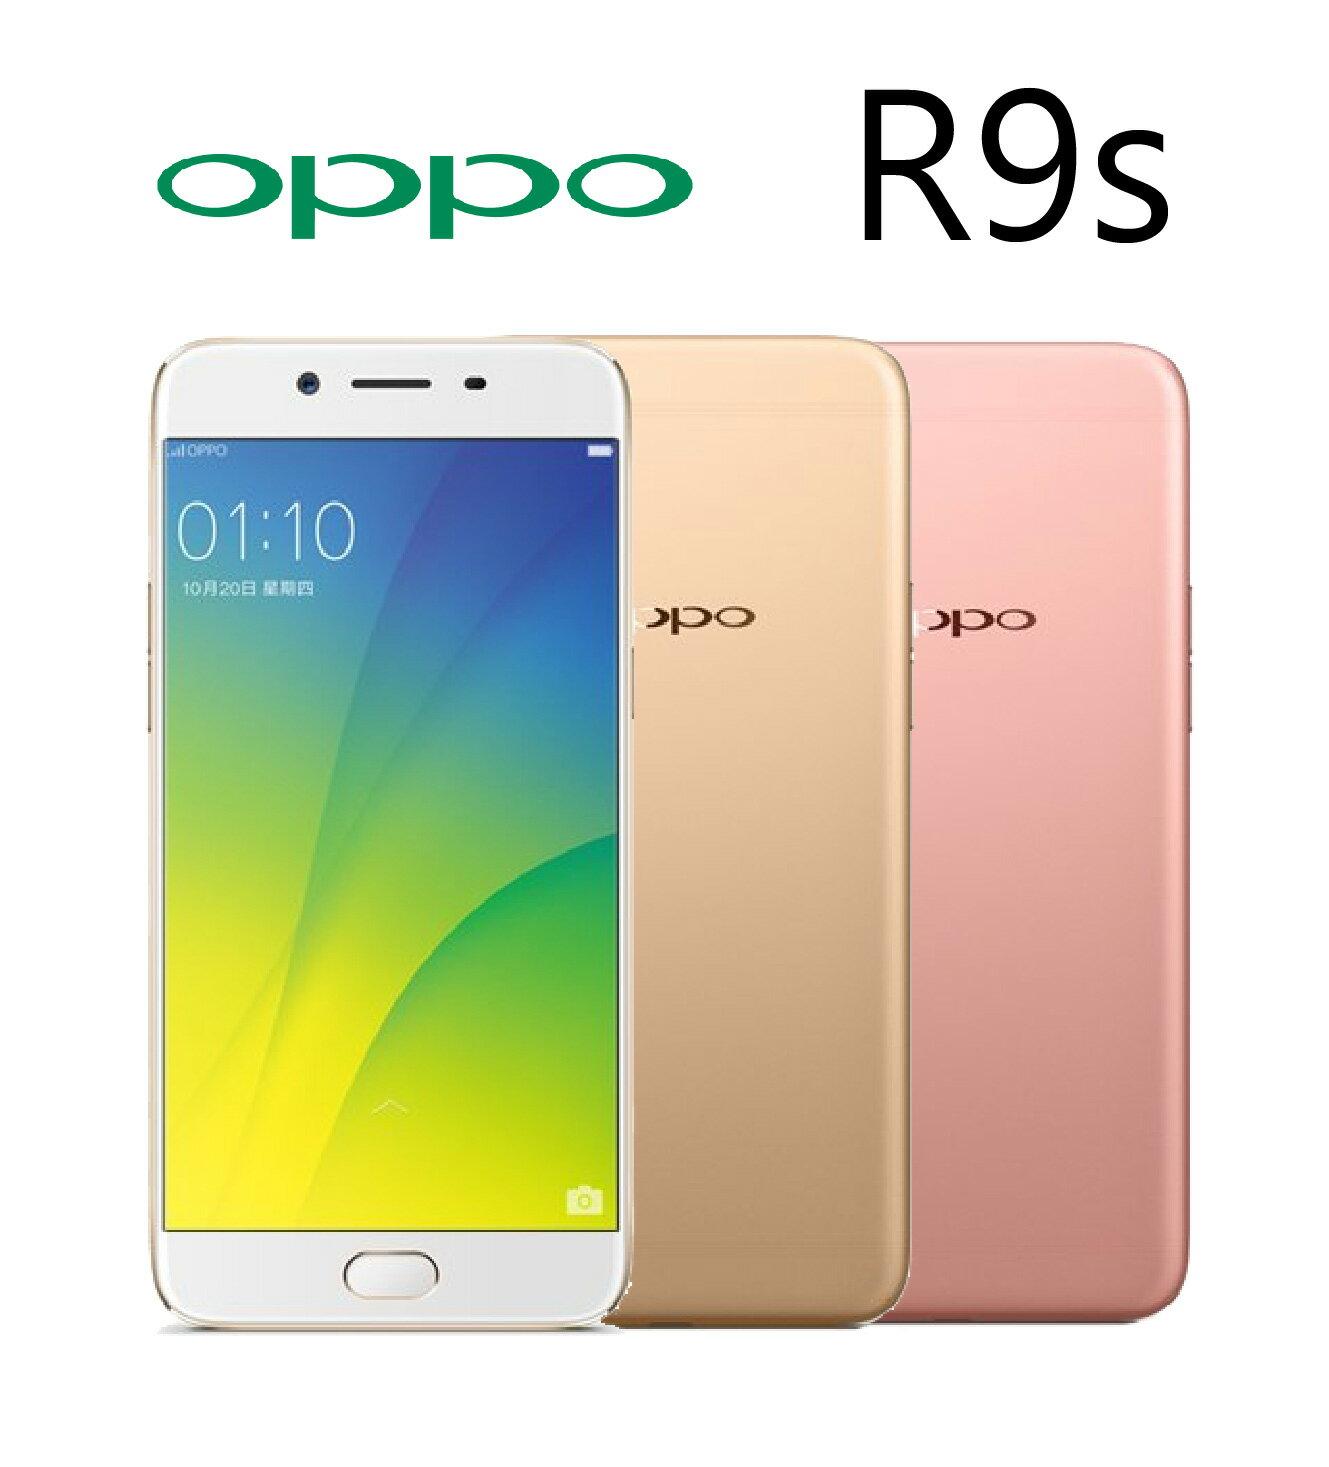 OPPO R9s雙卡雙待/VOOC 閃充技術 4GB/64GB 金/玫瑰金 《贈10000mAh行動電源+玻璃保貼》[6期零利率]